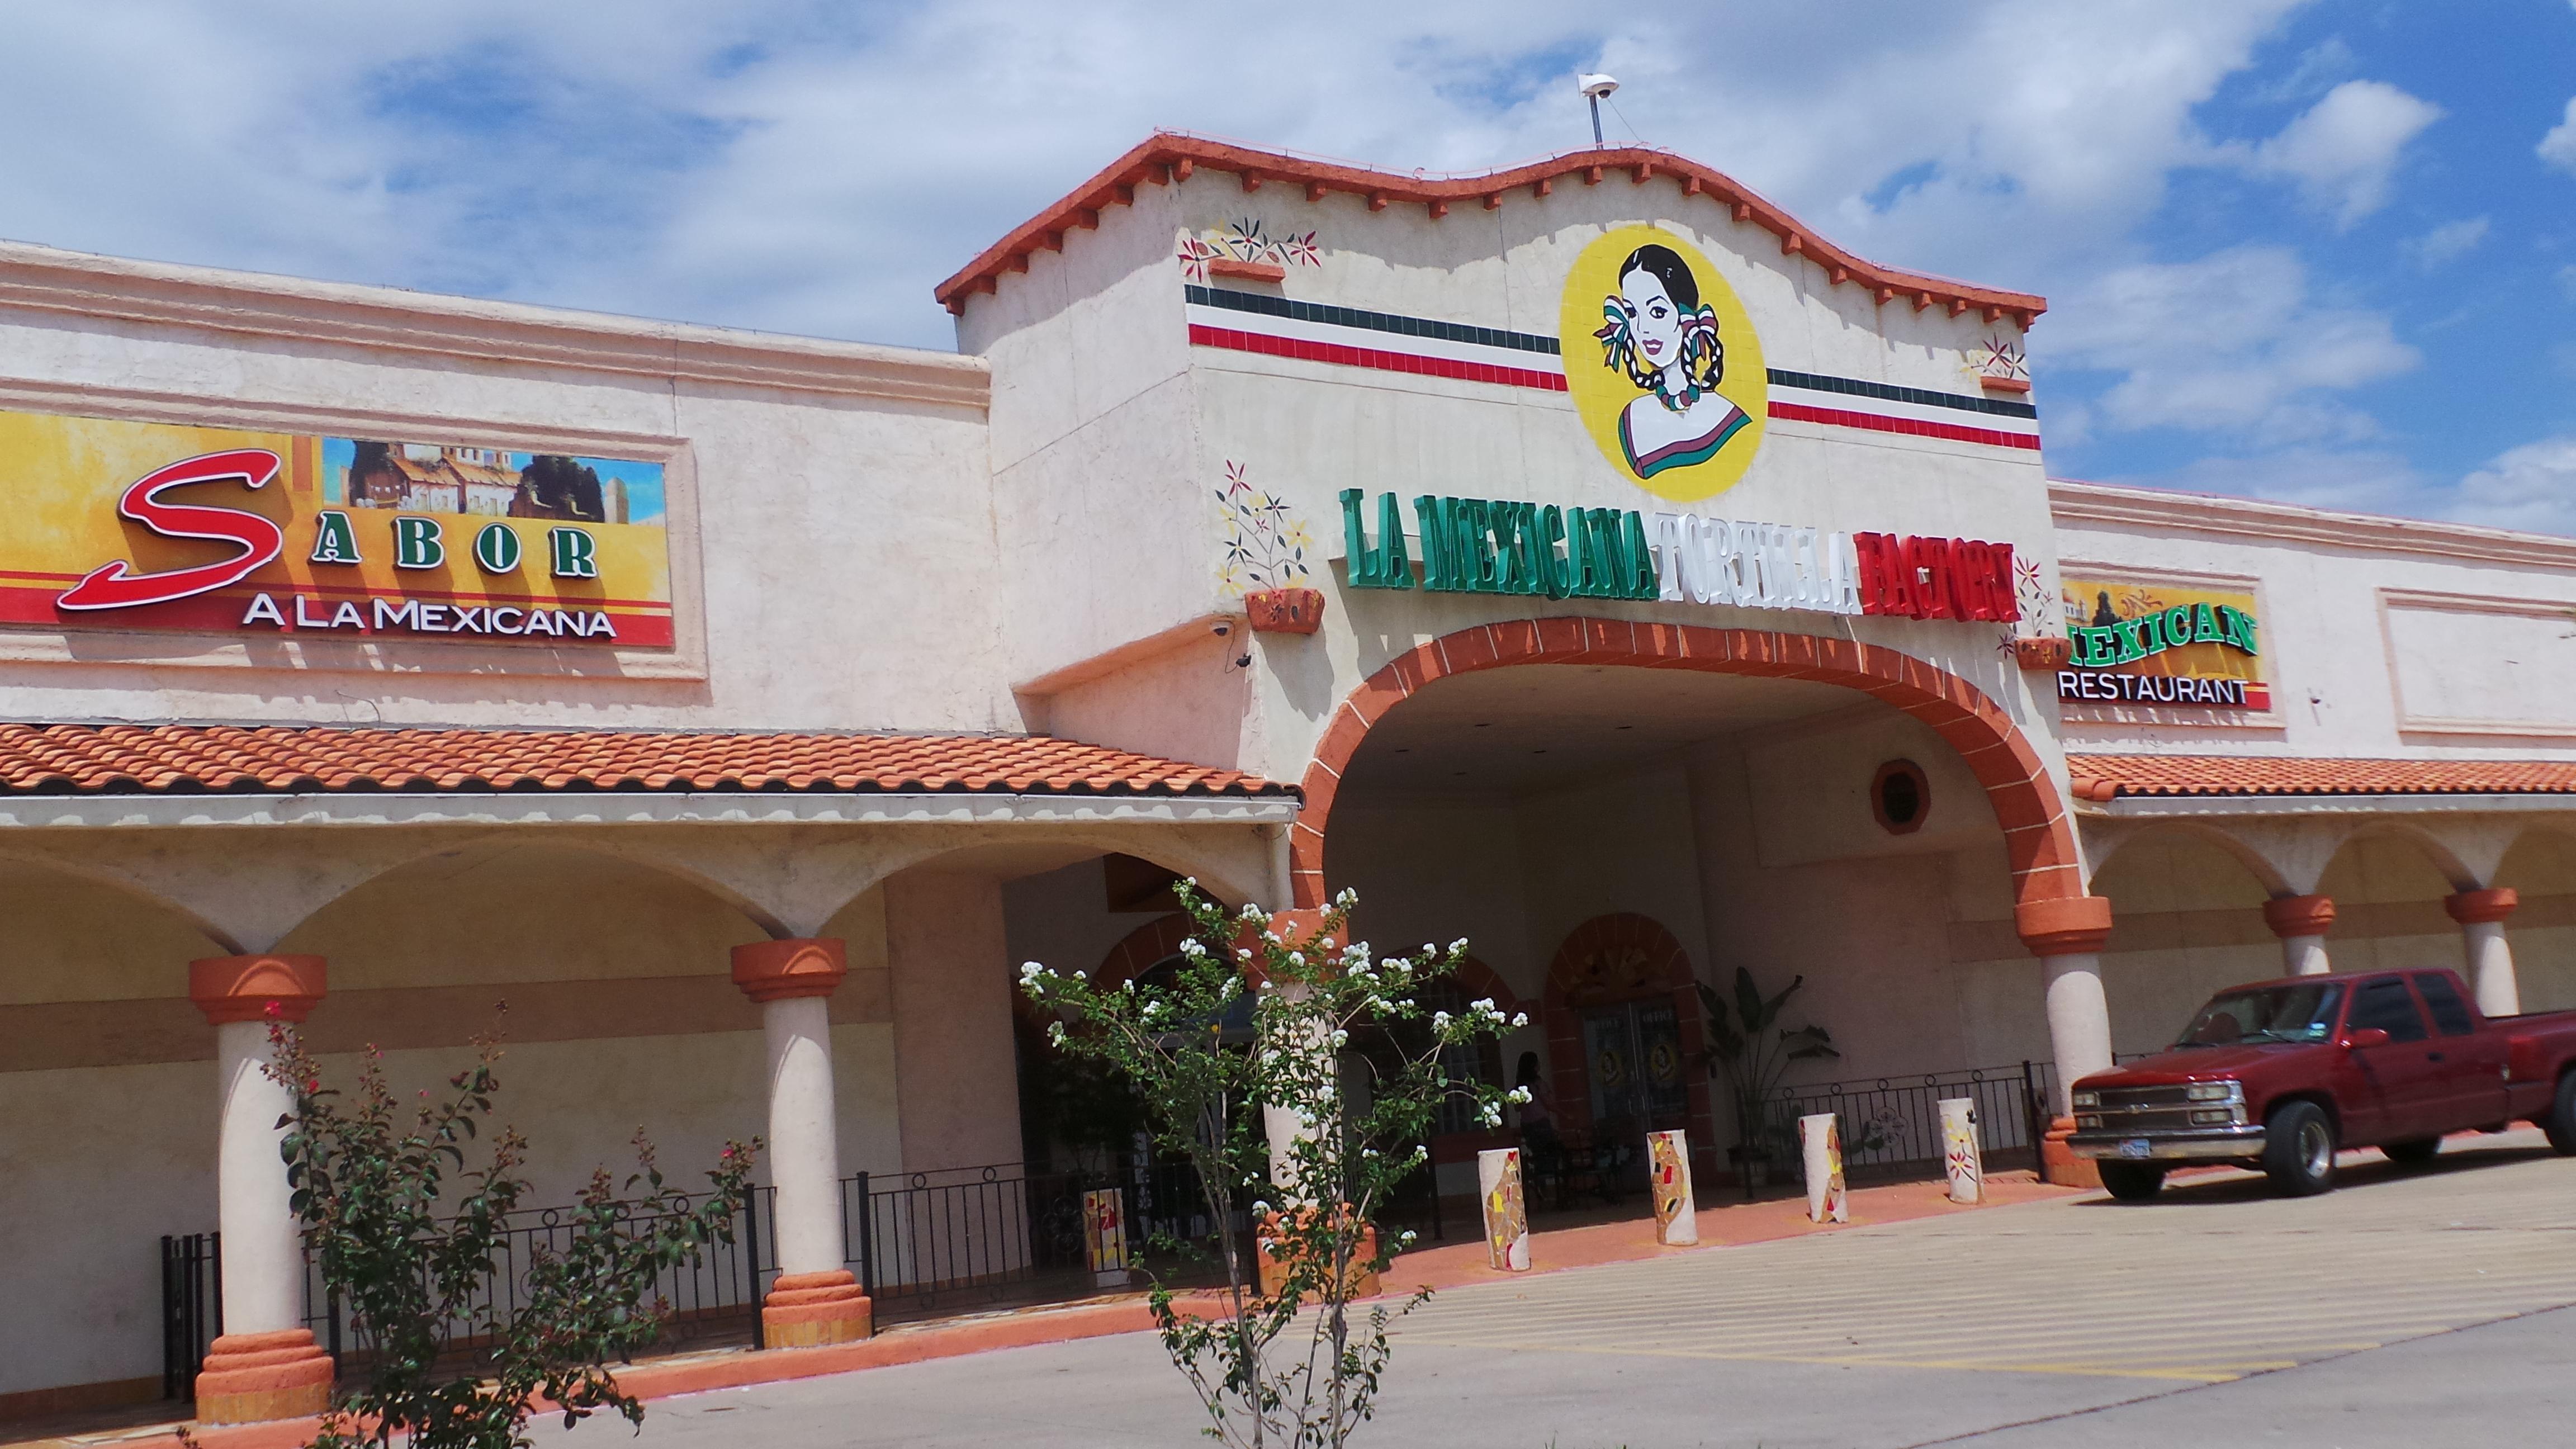 Sabor A La Mexicana Restaurant image 3